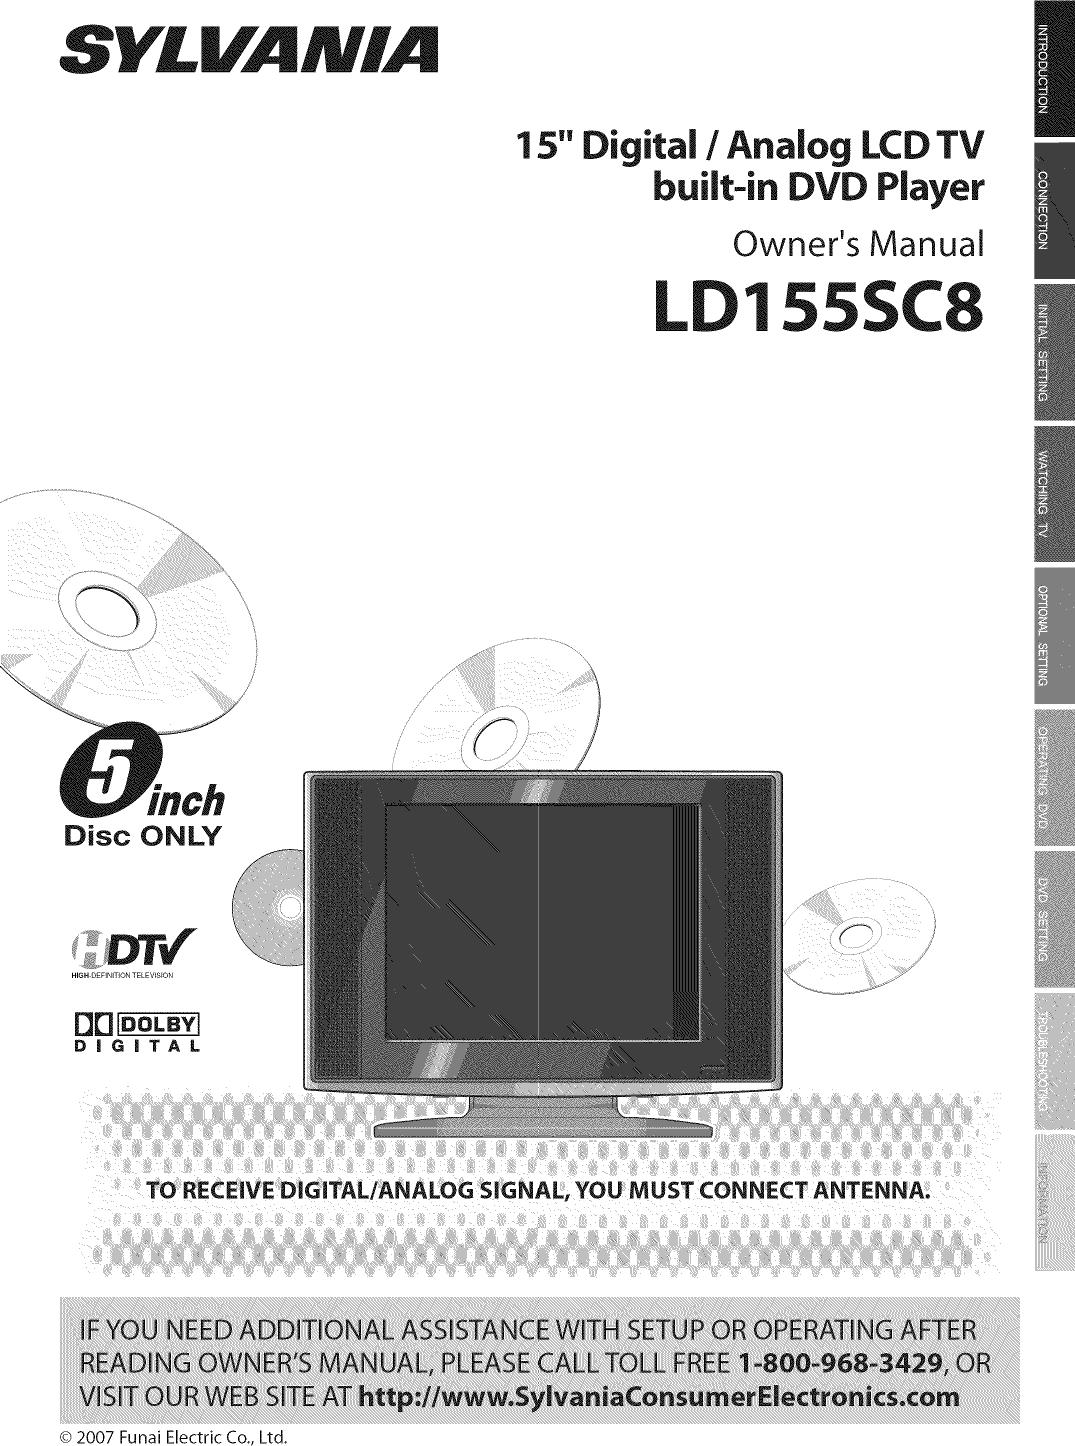 sylvania ld155sc8 user manual lcd television dvd manuals and guides rh usermanual wiki Funai Review Funai DVD Player